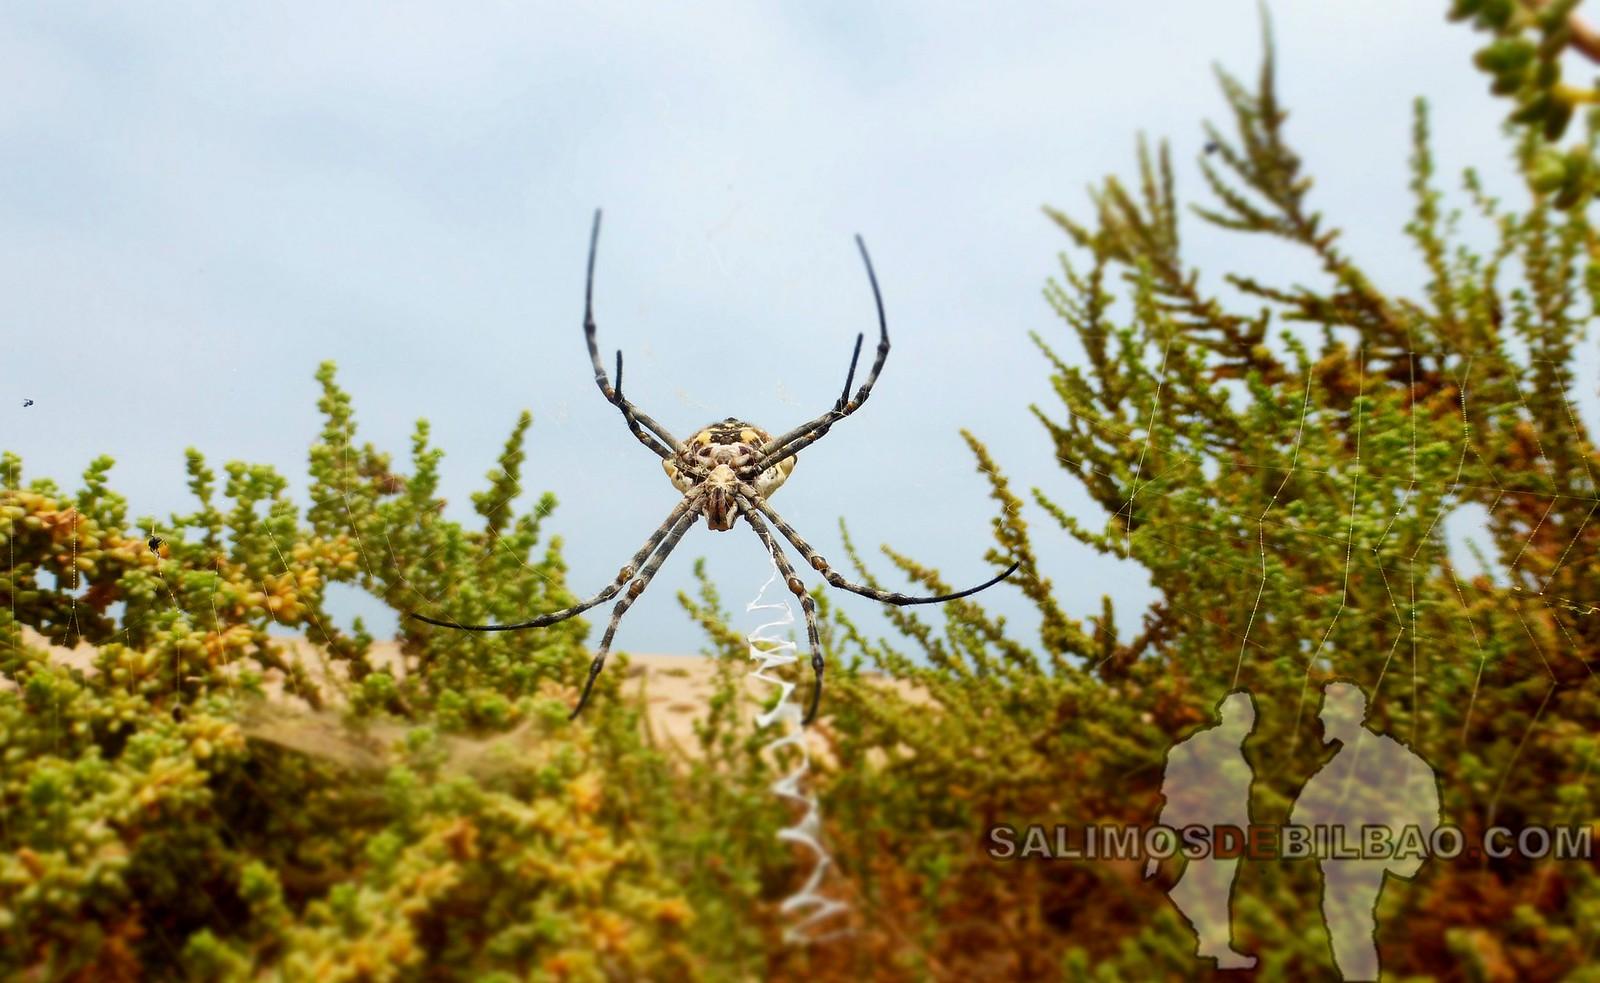 170. Araña, Paseo del Faro a la playa, Dakhla